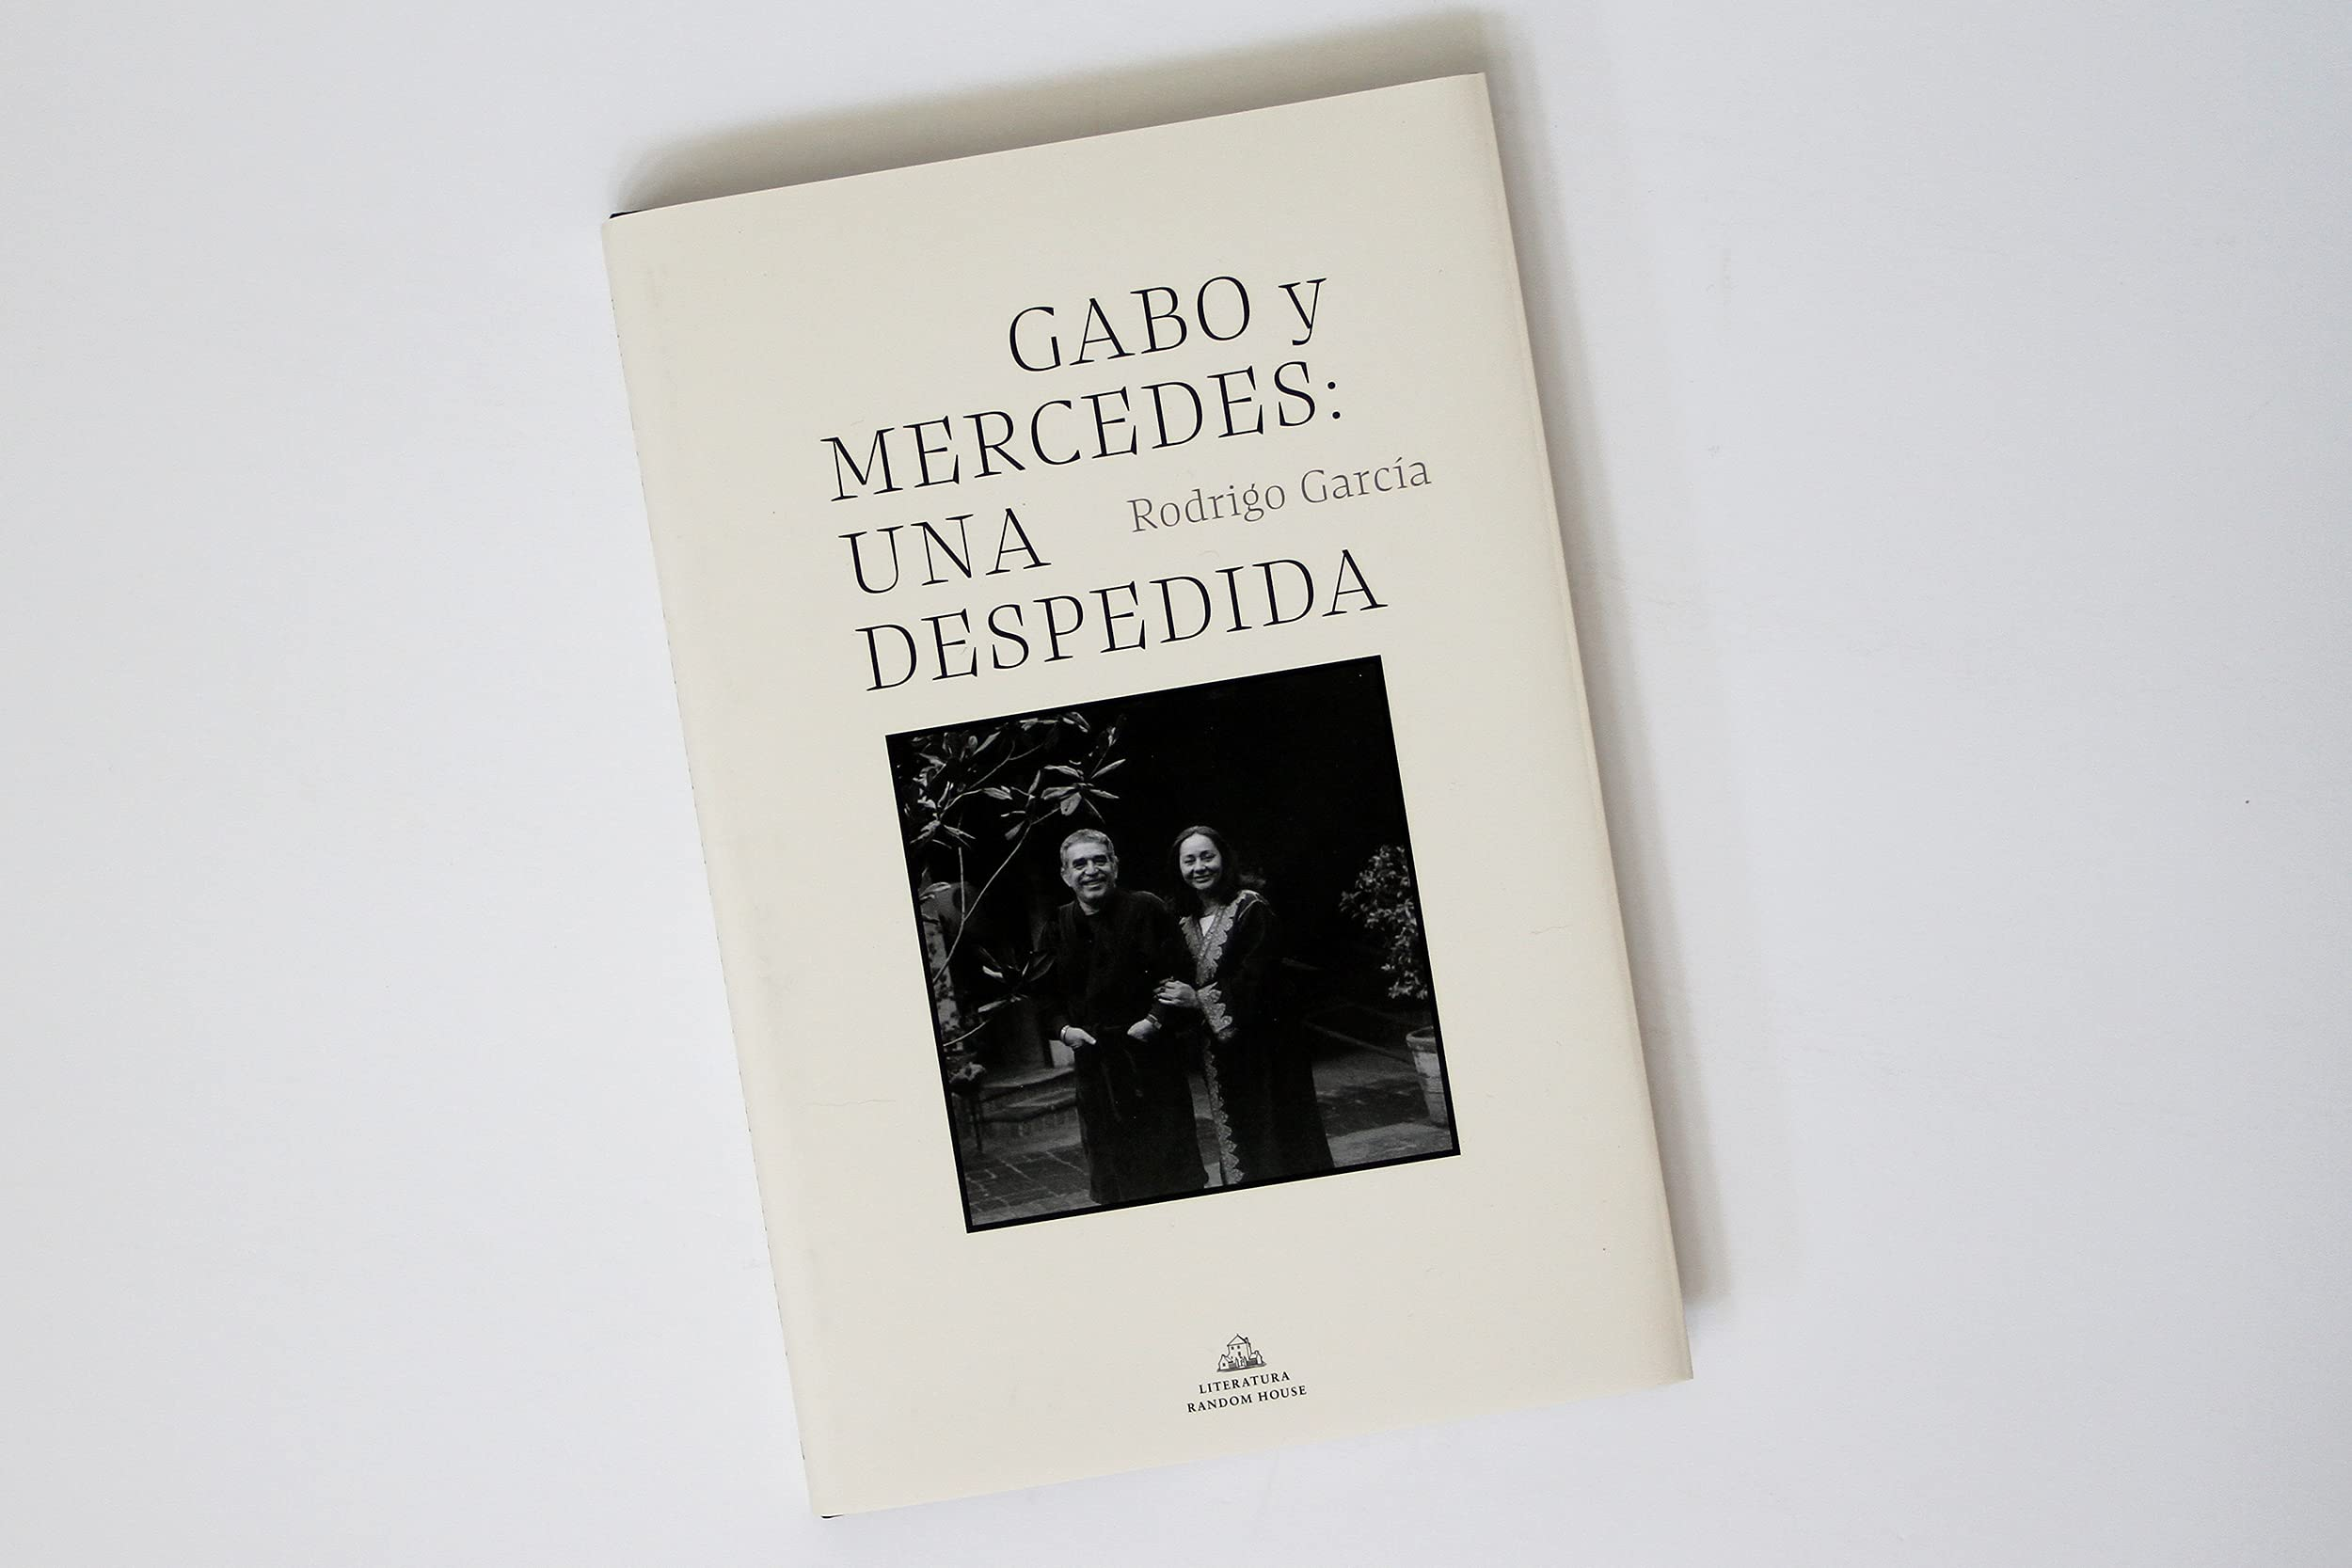 Amazon.com: Gabo y Mercedes: una despedida / A Farewell to Gabo and Mercedes (Spanish Edition) (9781644733950): Garcia Barcha, Rodrigo: Books